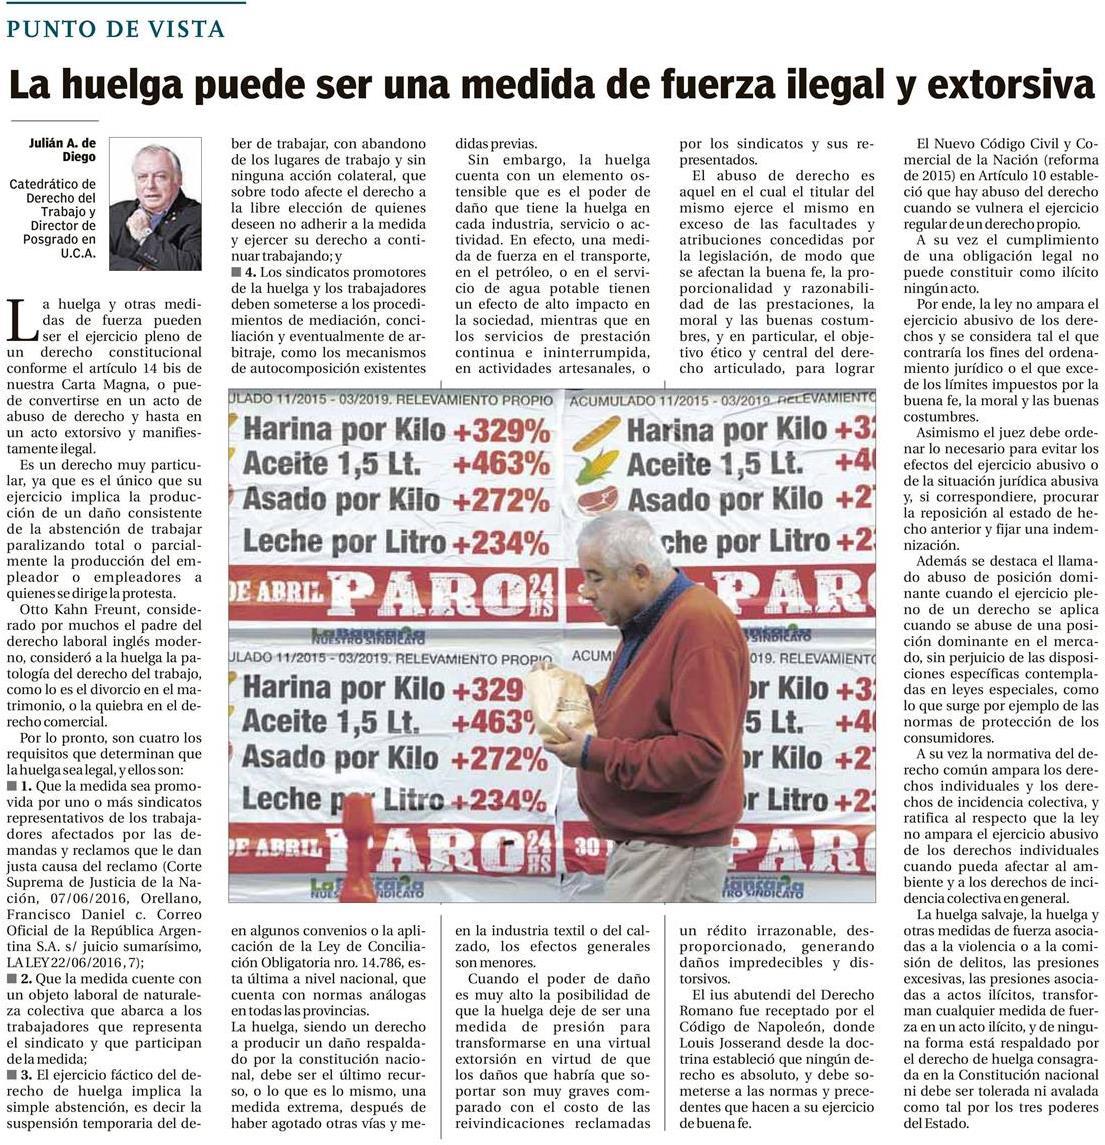 El Cronista 03.05.19 - JdD